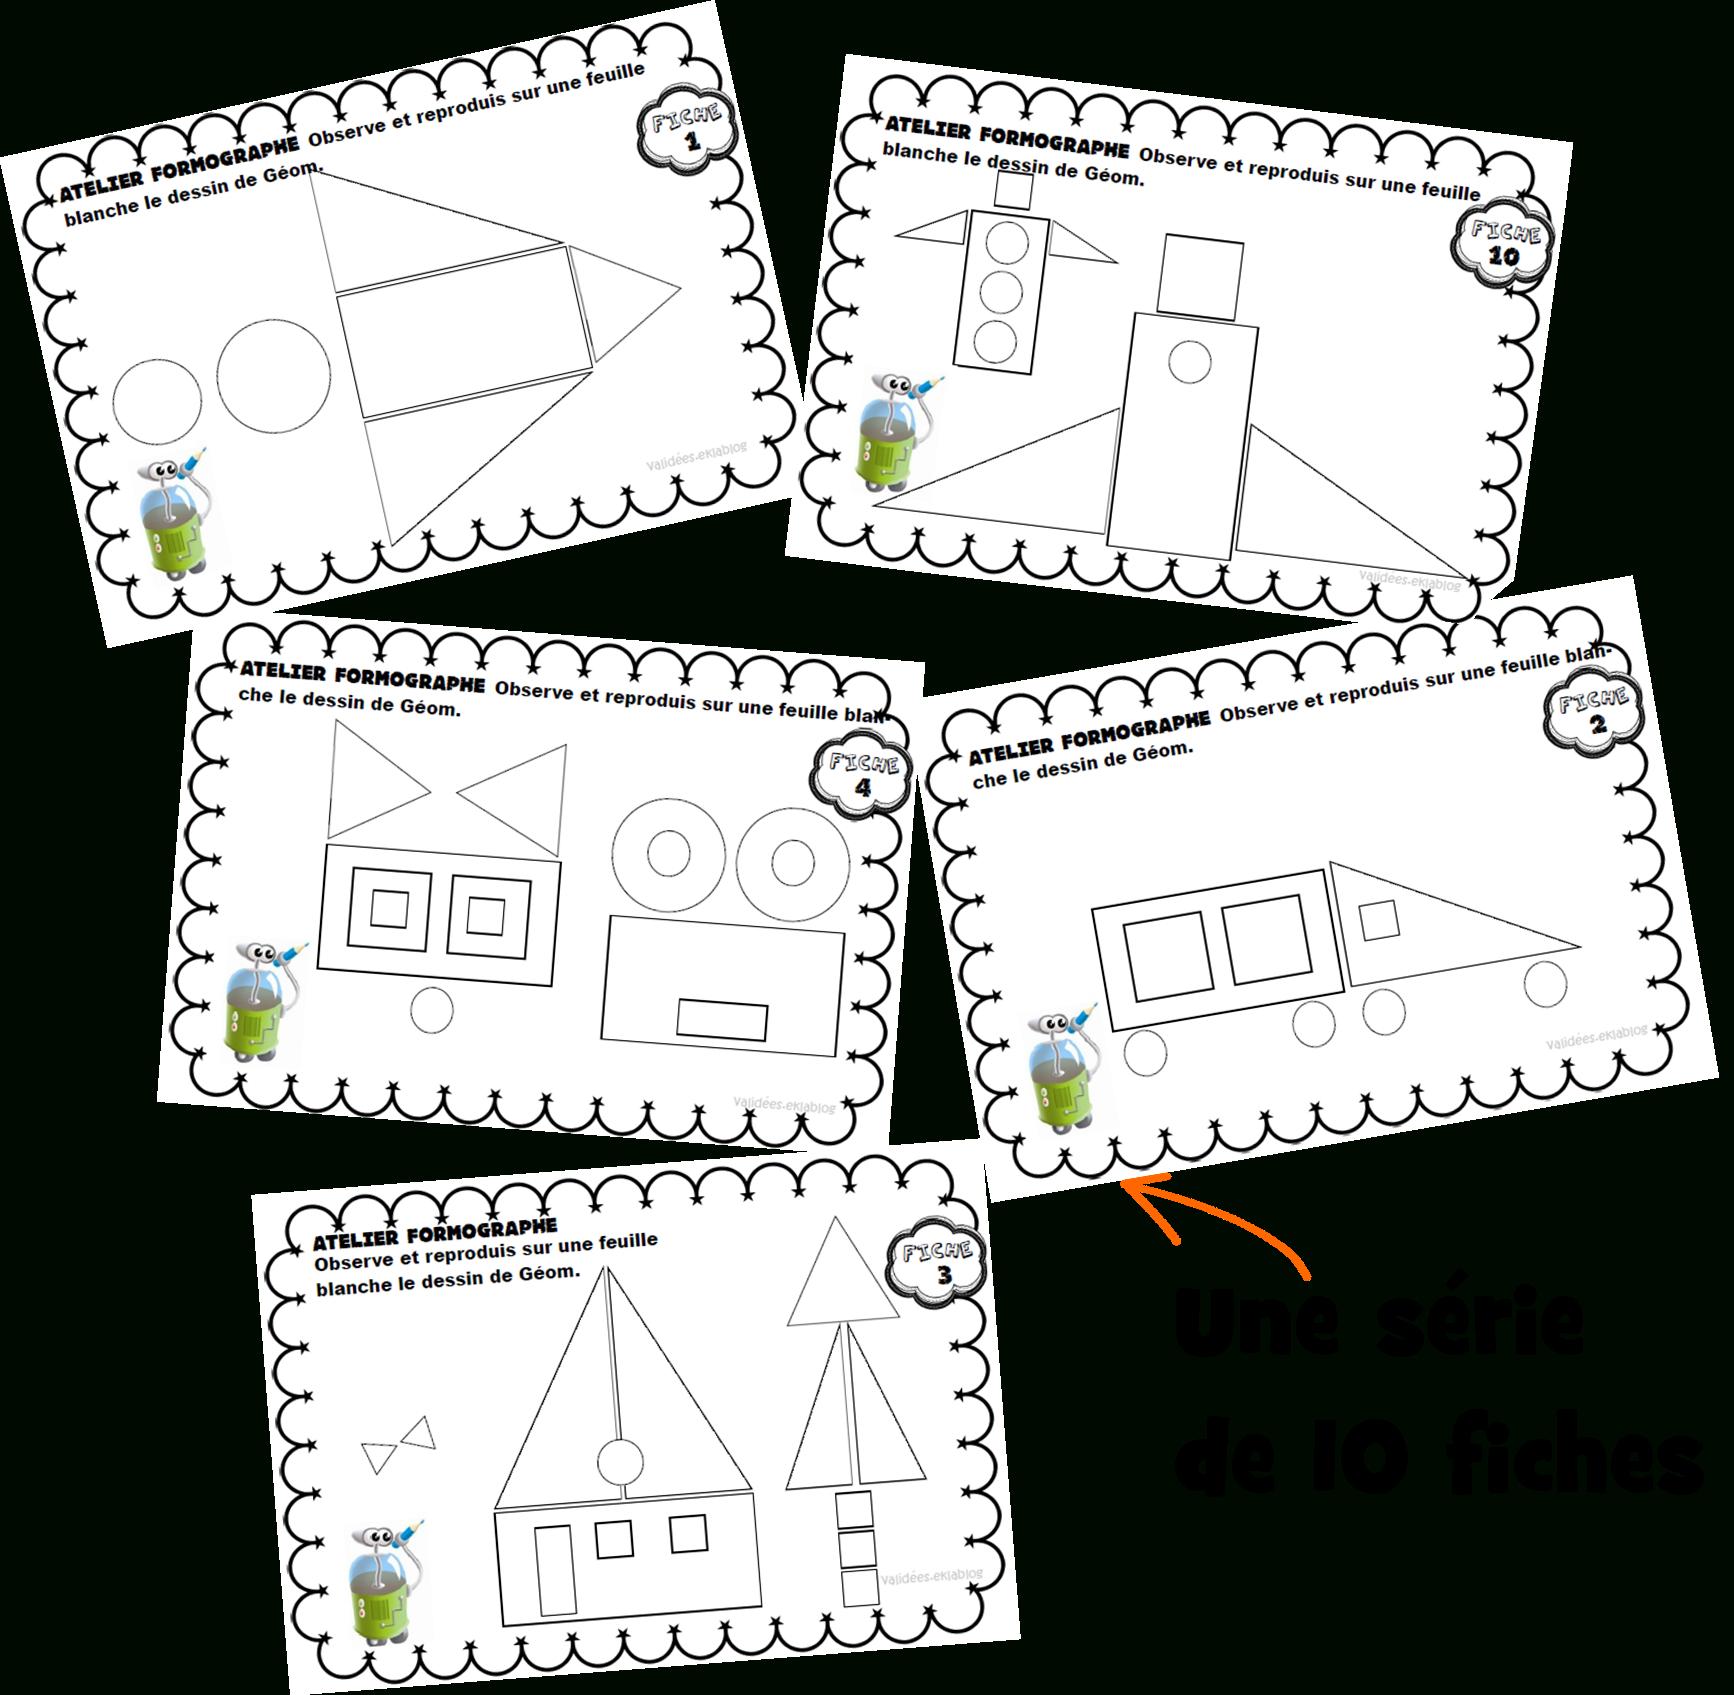 Atelier Formographe - Géométrie | Géométrie Ce1, Géométrie destiné Dessin Géométrique Ce2